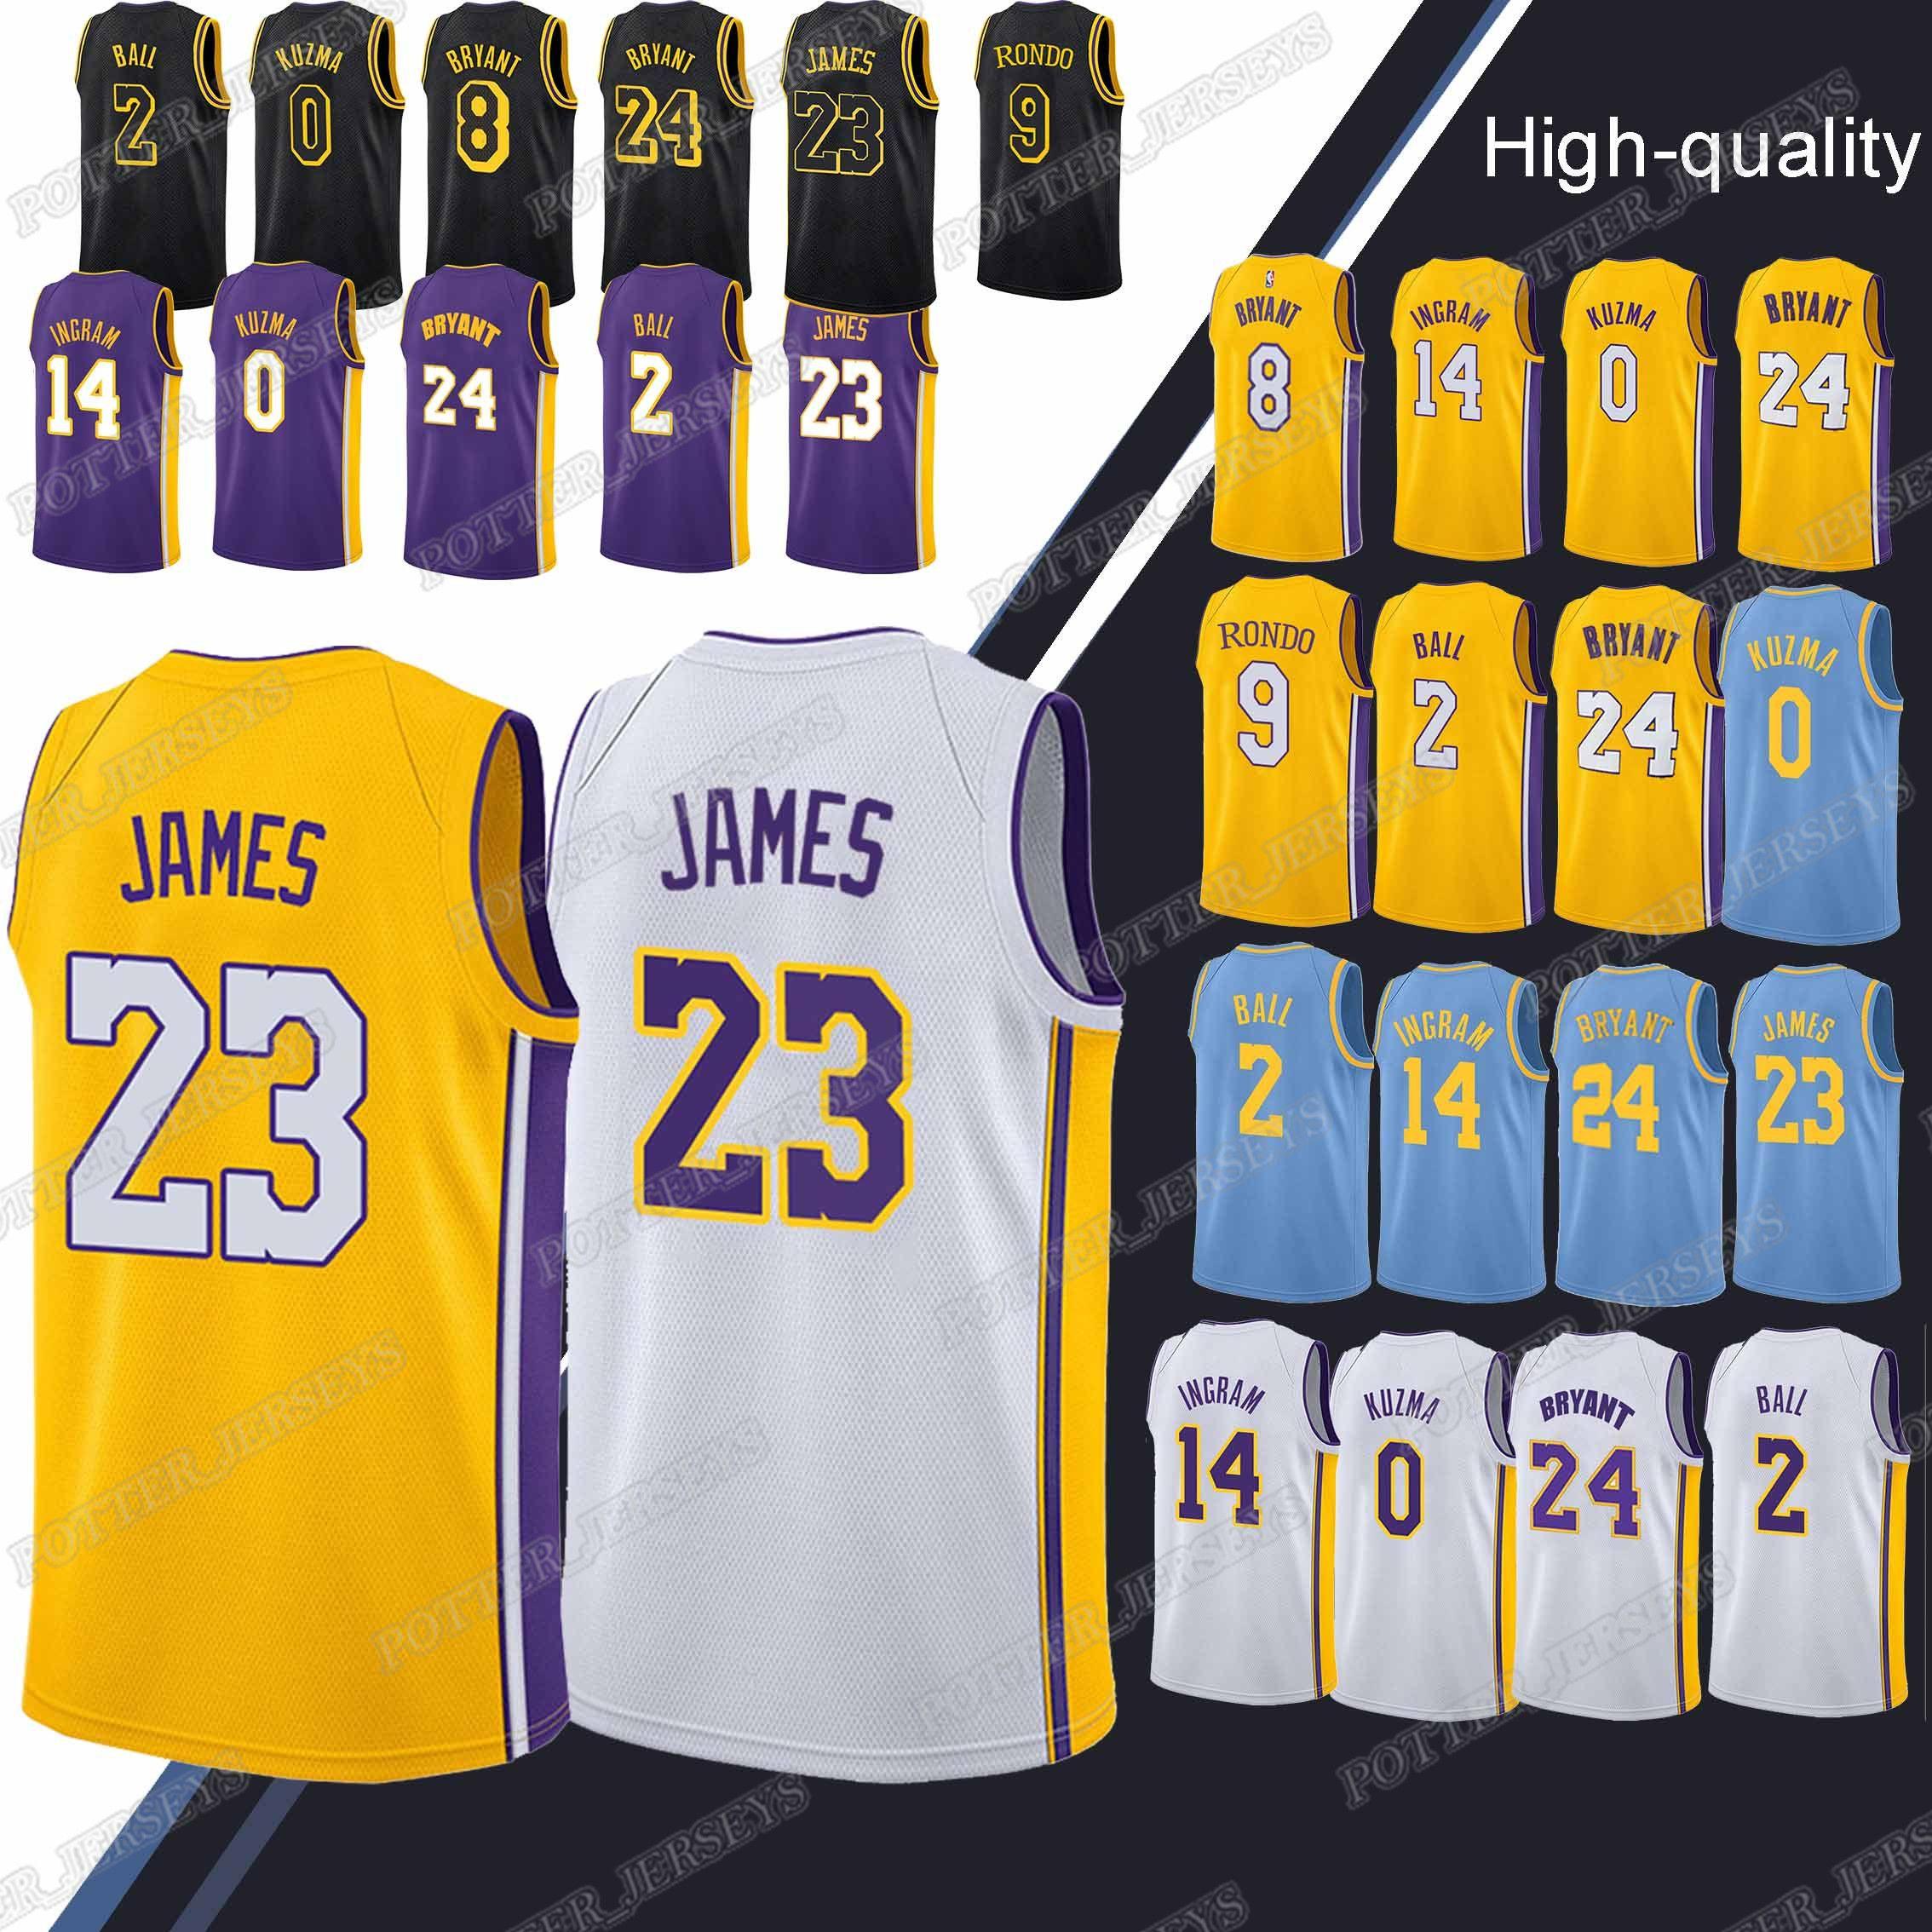 100% authentic ba1fd 26b88 23 LeBron James Los Angeles jersey Laker 24 Bryant 0 Kuzma 2 Ball Hot sale  2019 menbasketball jerseys